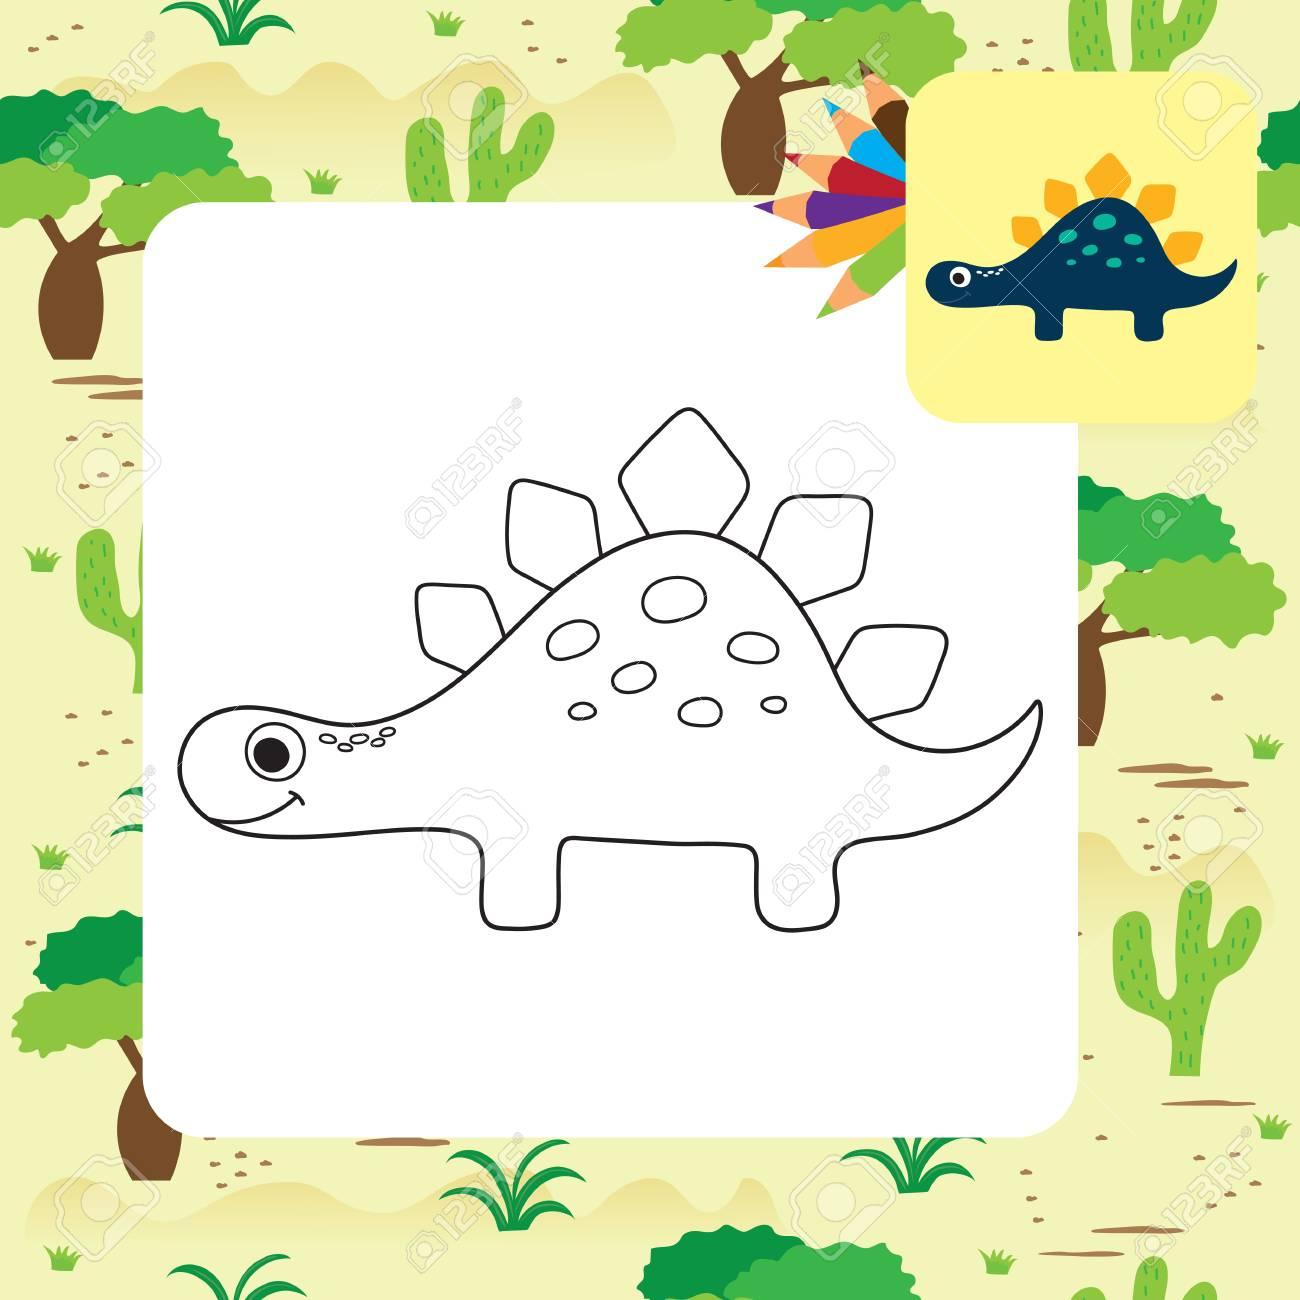 Cute Cartoon Dinosaur Coloring Page Vector Illustration Royalty